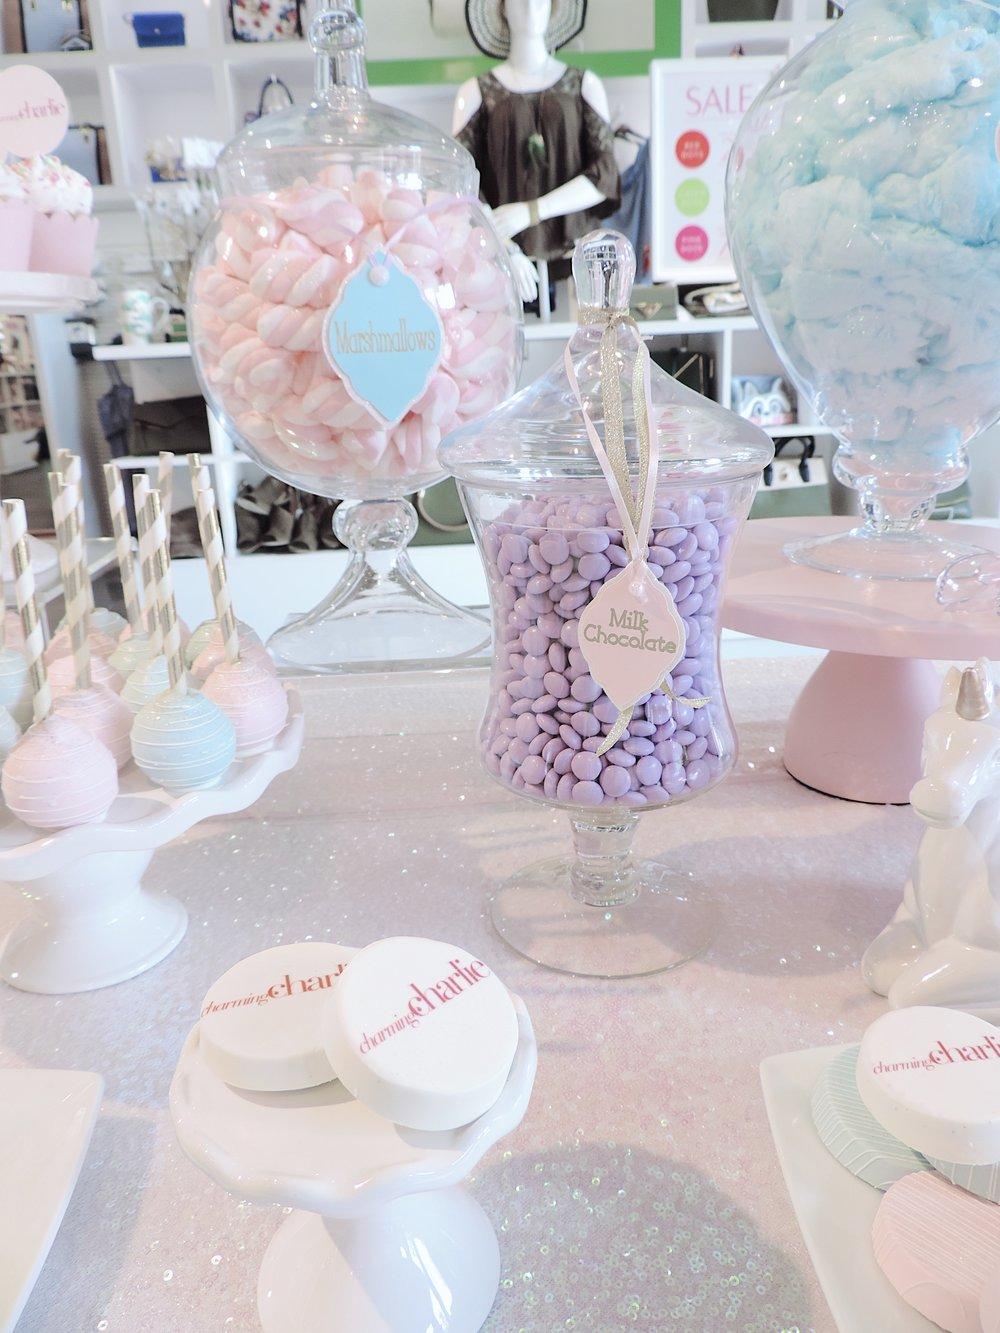 Charming Charlie-Loey Lane-SugarPartiesLA-Dessert Table-Milk Chocolate-Candy Table.JPG